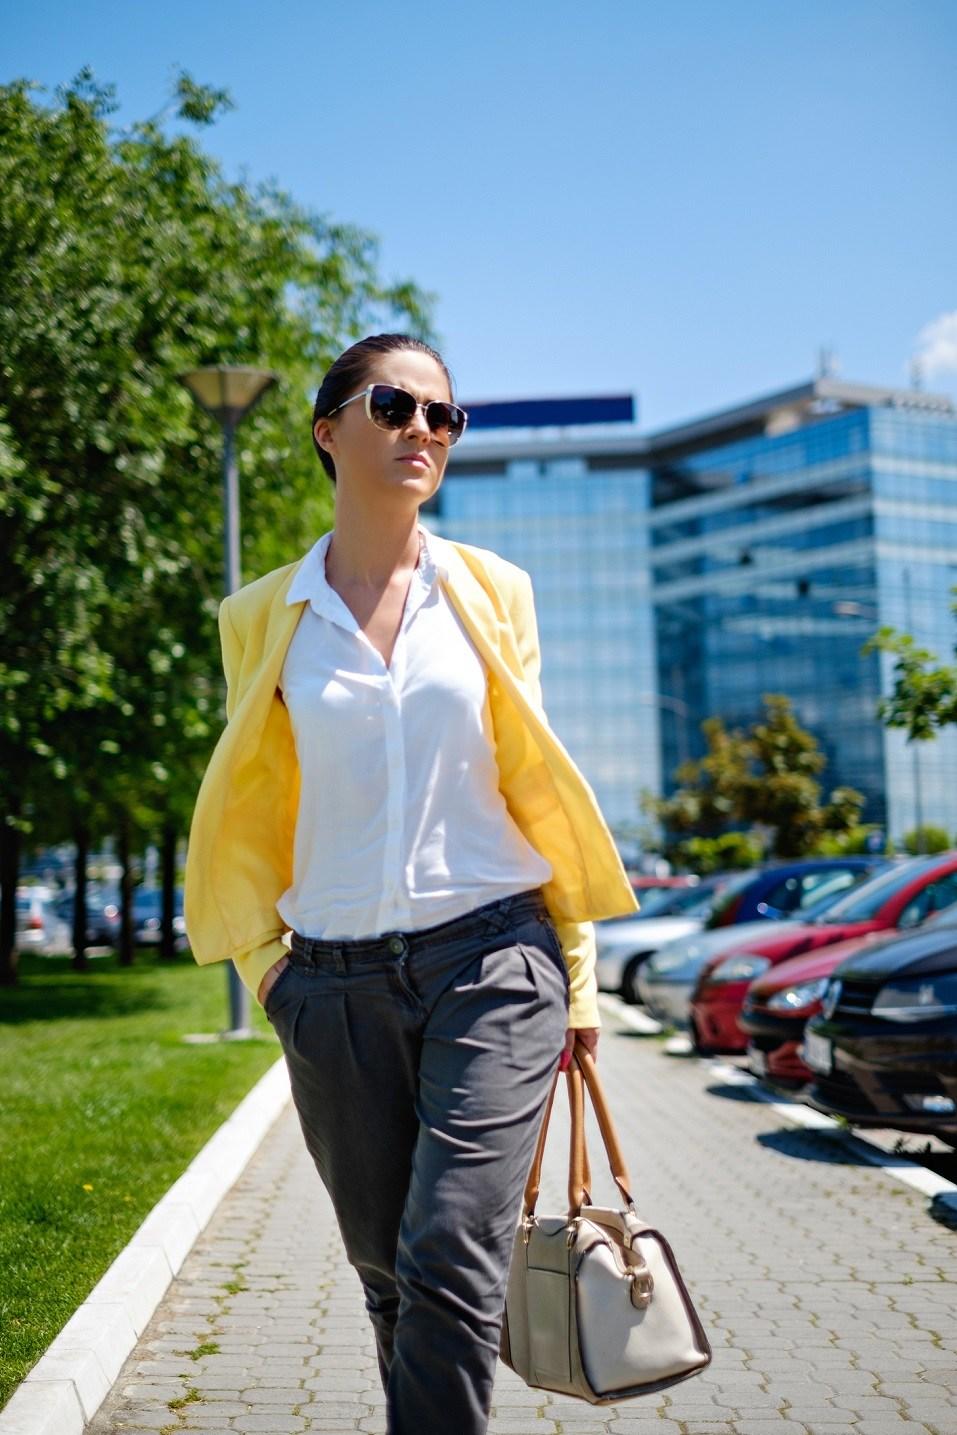 Woman walking in a hurry on the sidewalk